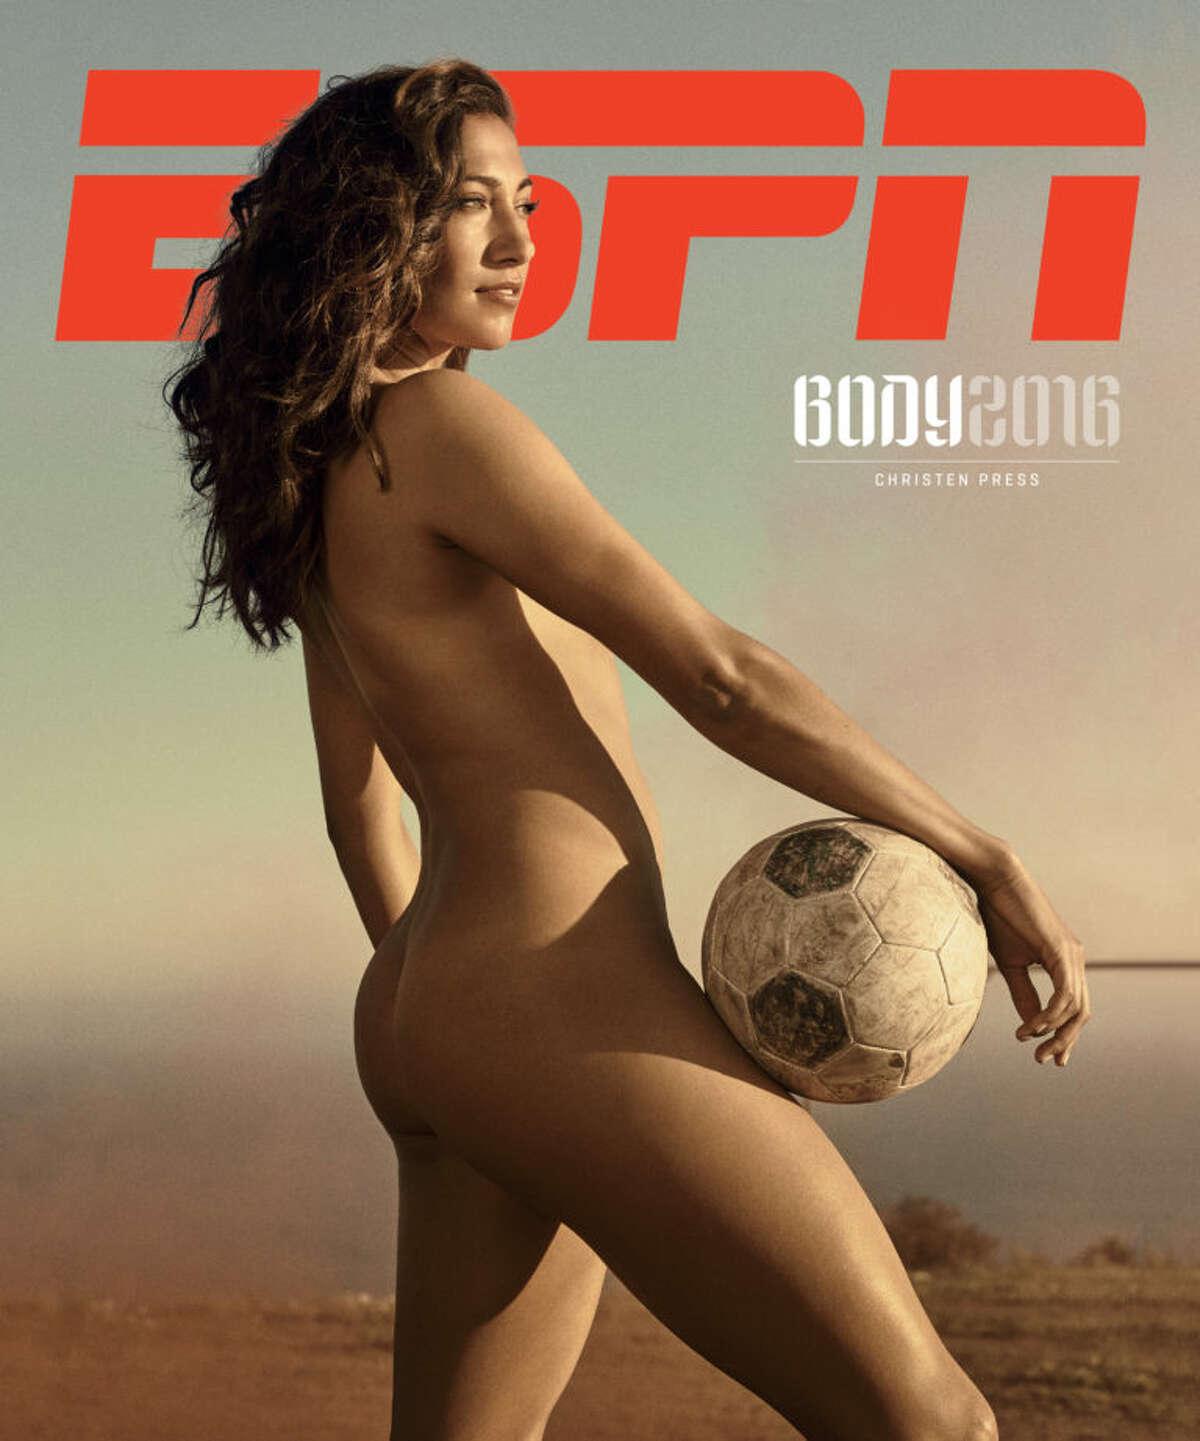 Soccer player Christen Press in the 2016 ESPN Body Issue.